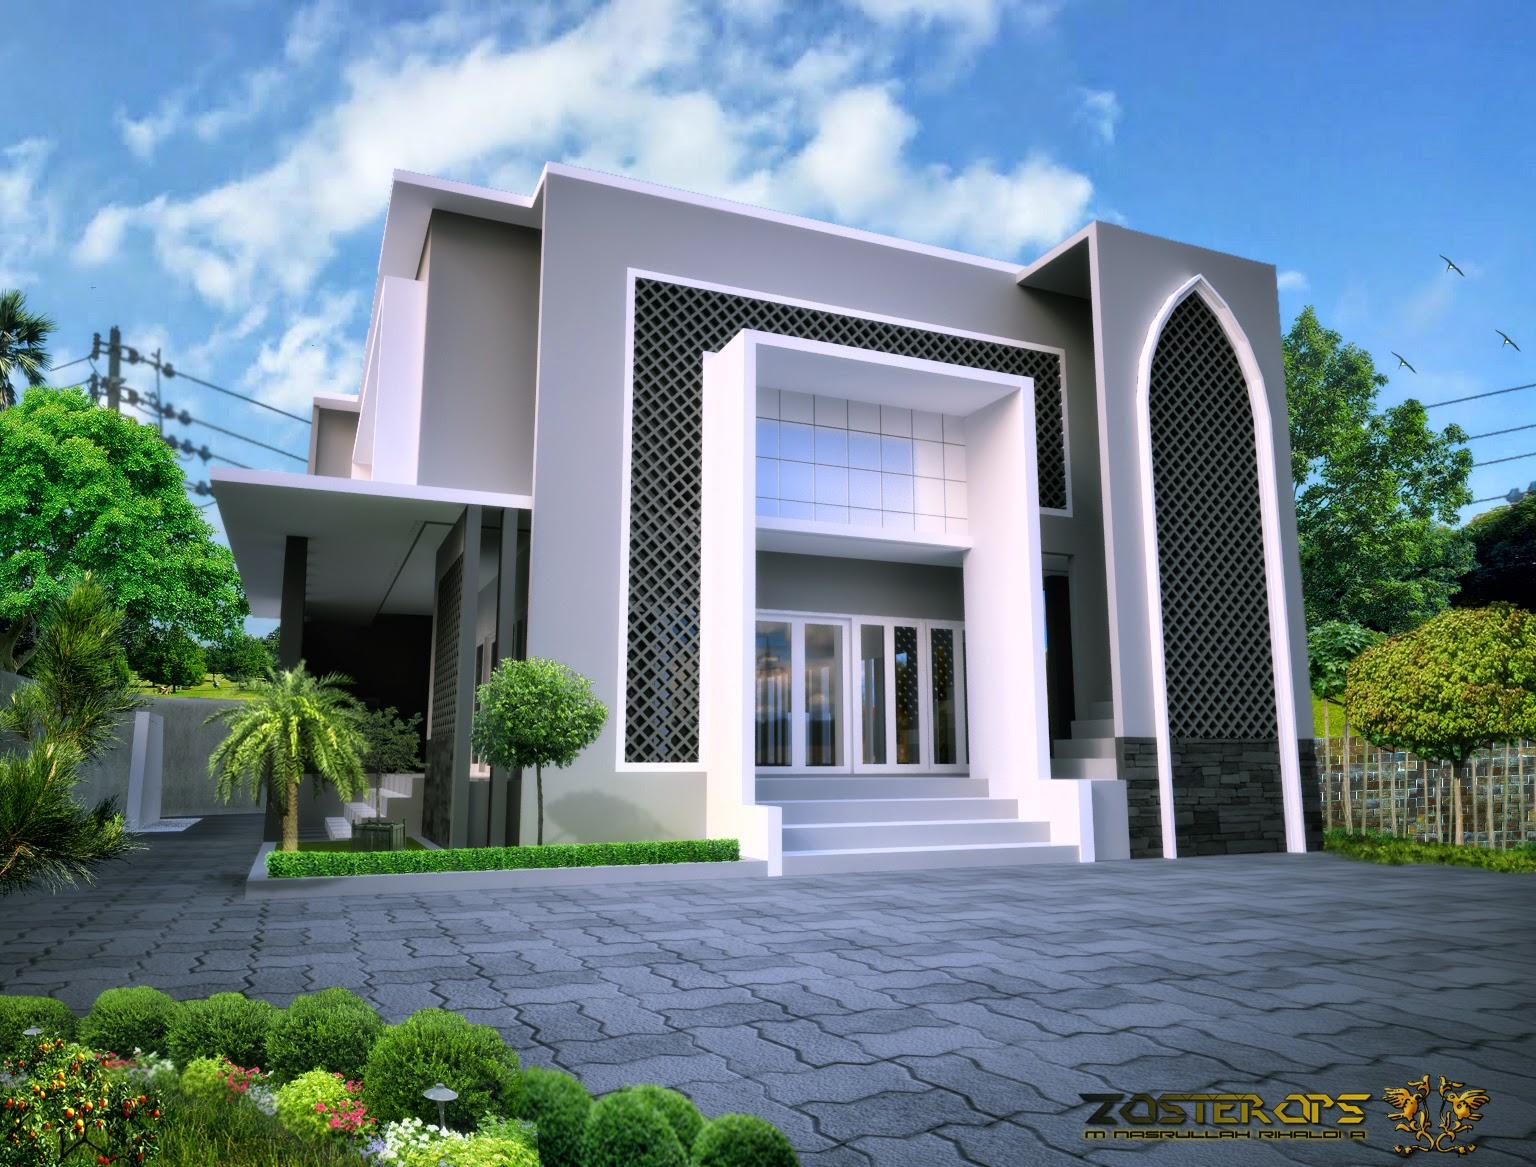 Rencana masjid minimalis di sman 8 cirebon desain for Design minimalis modern